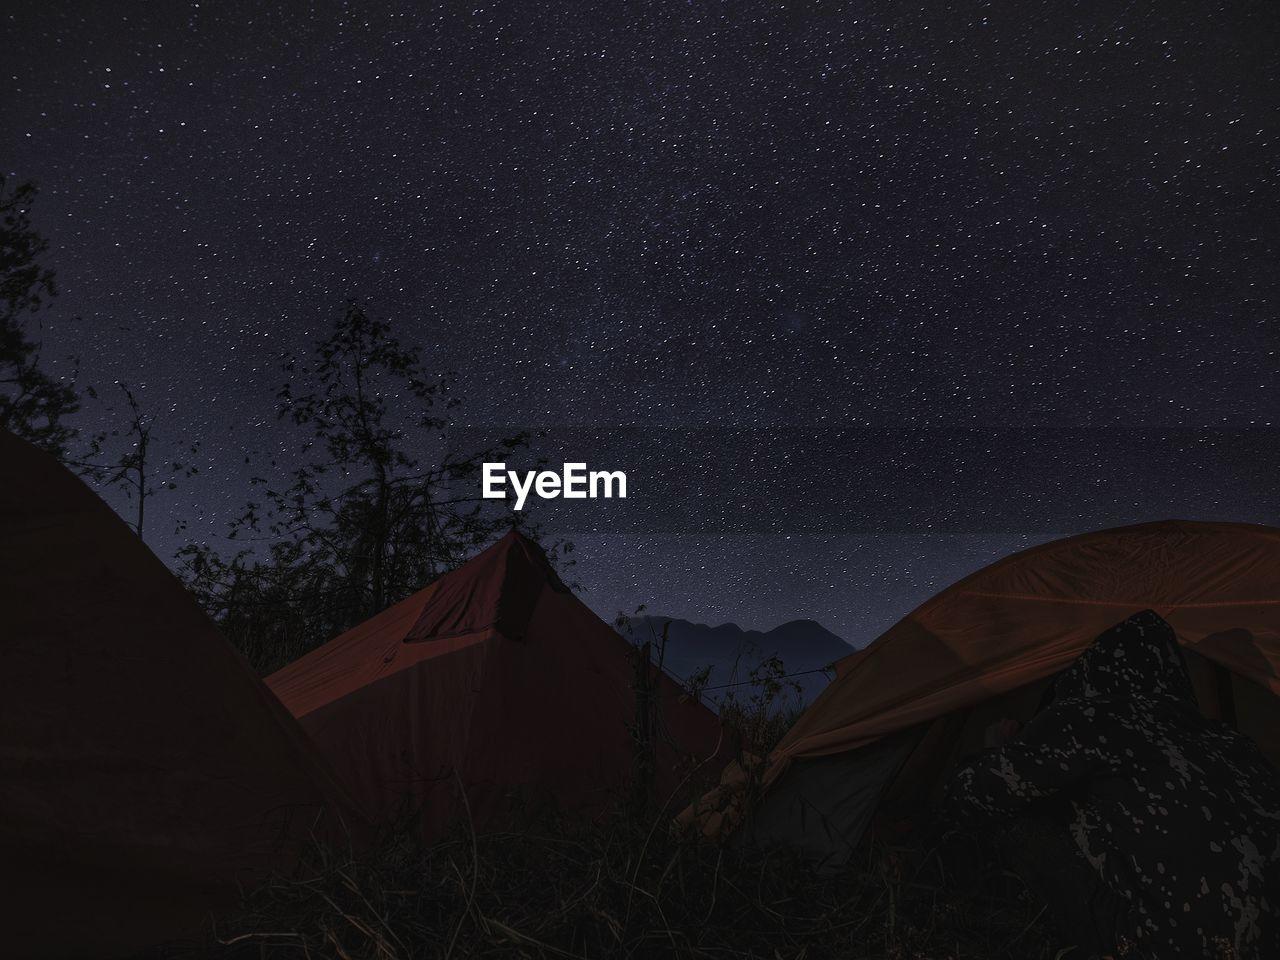 Camping on the mountain peak among sky full of stars